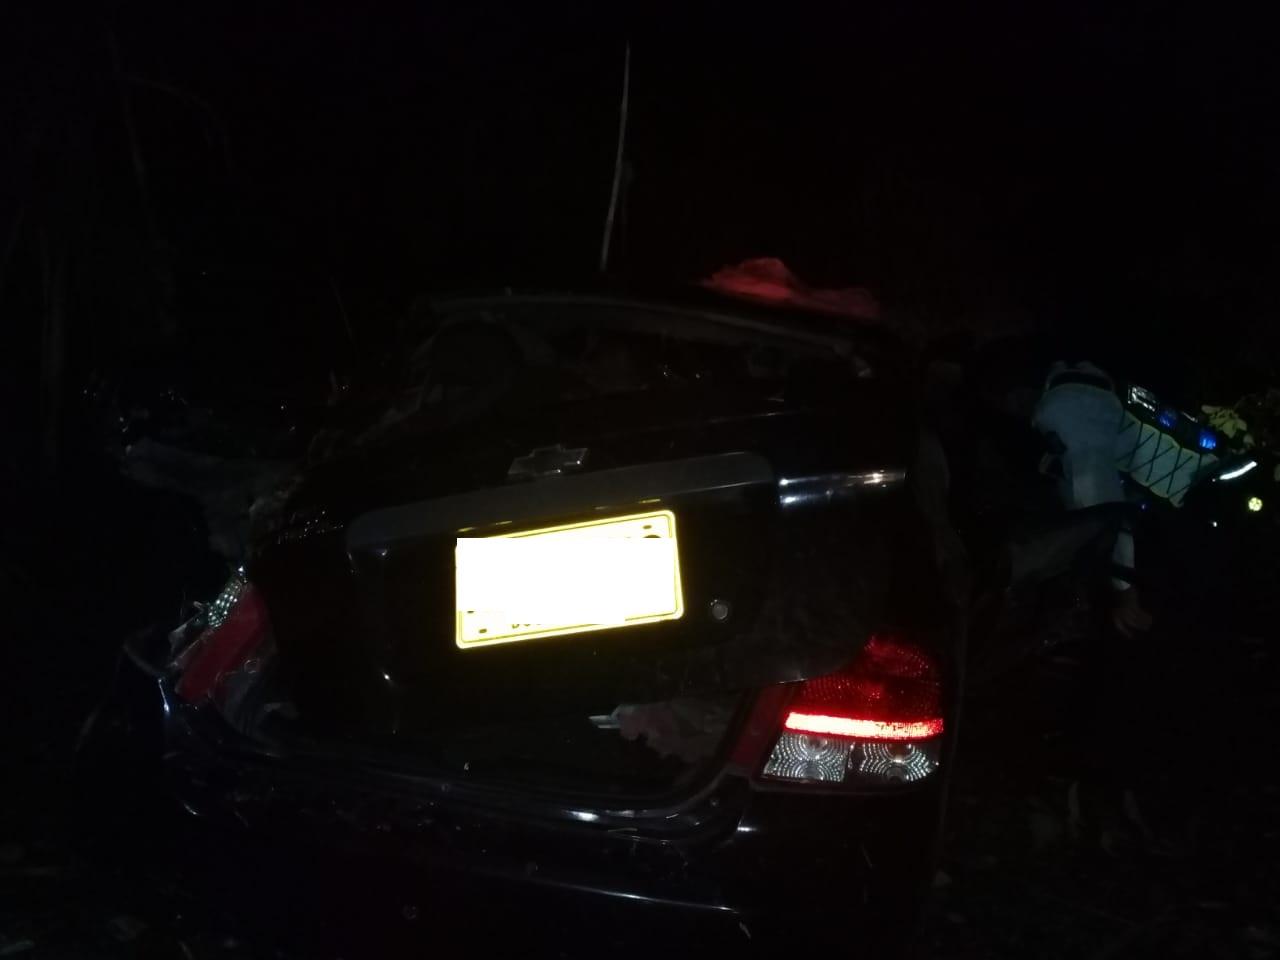 Tremendo Accidente¡¡ Vehículo se fue a un abismo en Santa Bárbara Antioquia